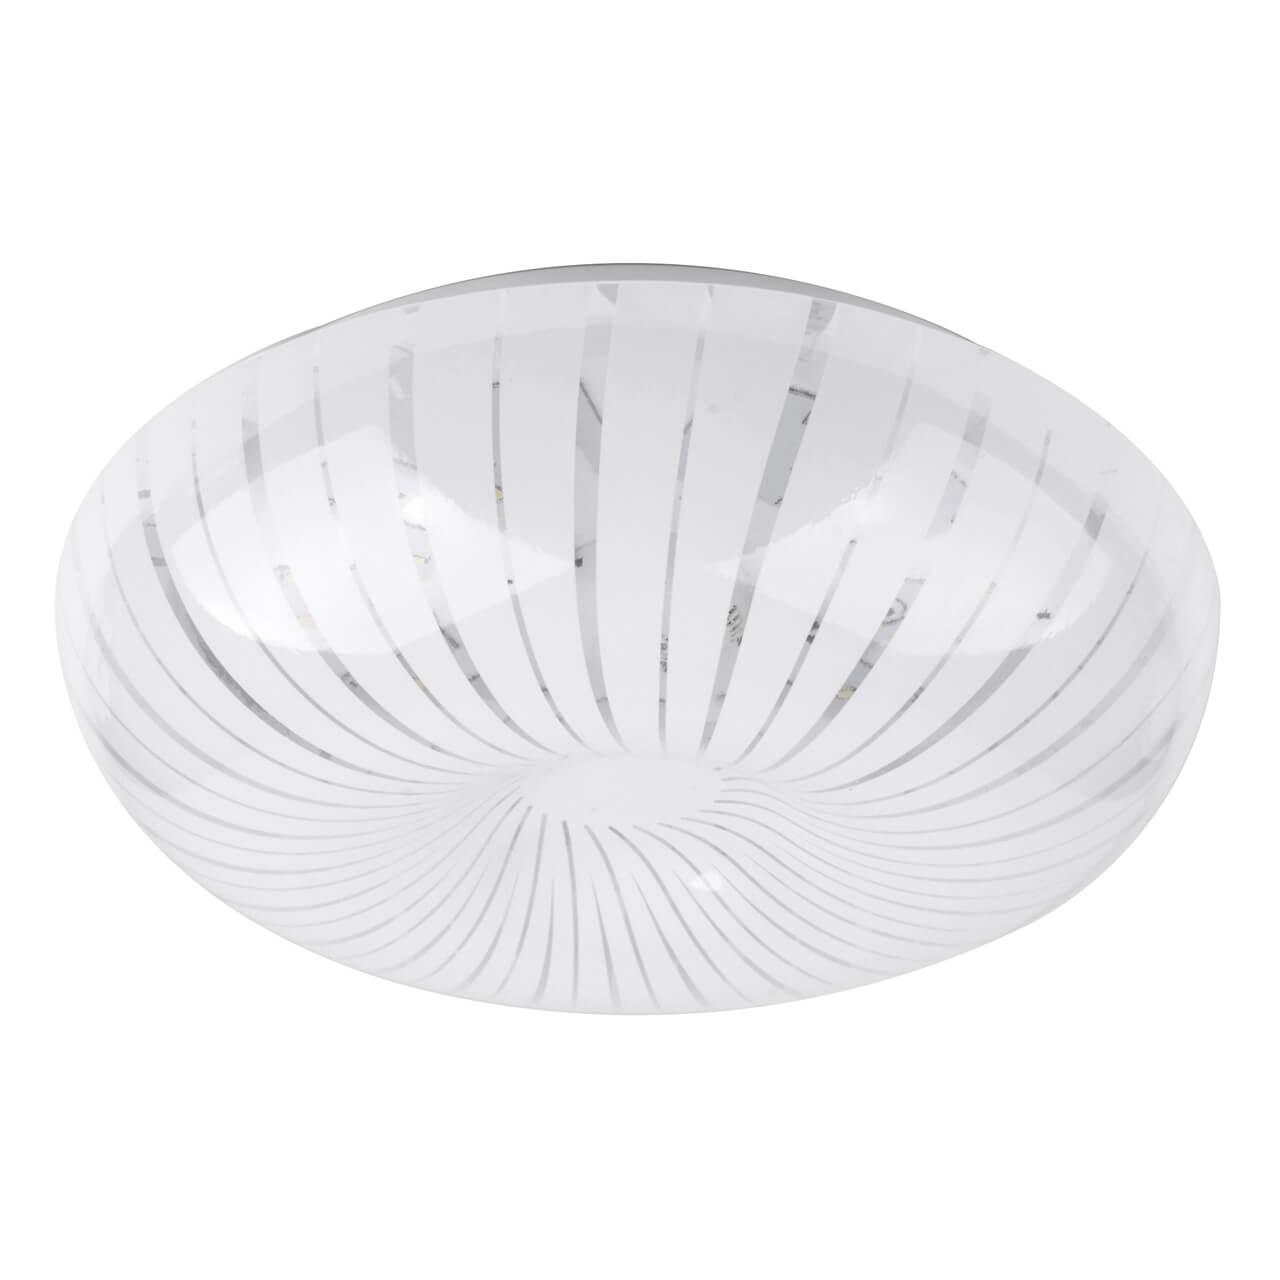 Светильник ЭРА SPB-6-18-6,5K (A) Медуза